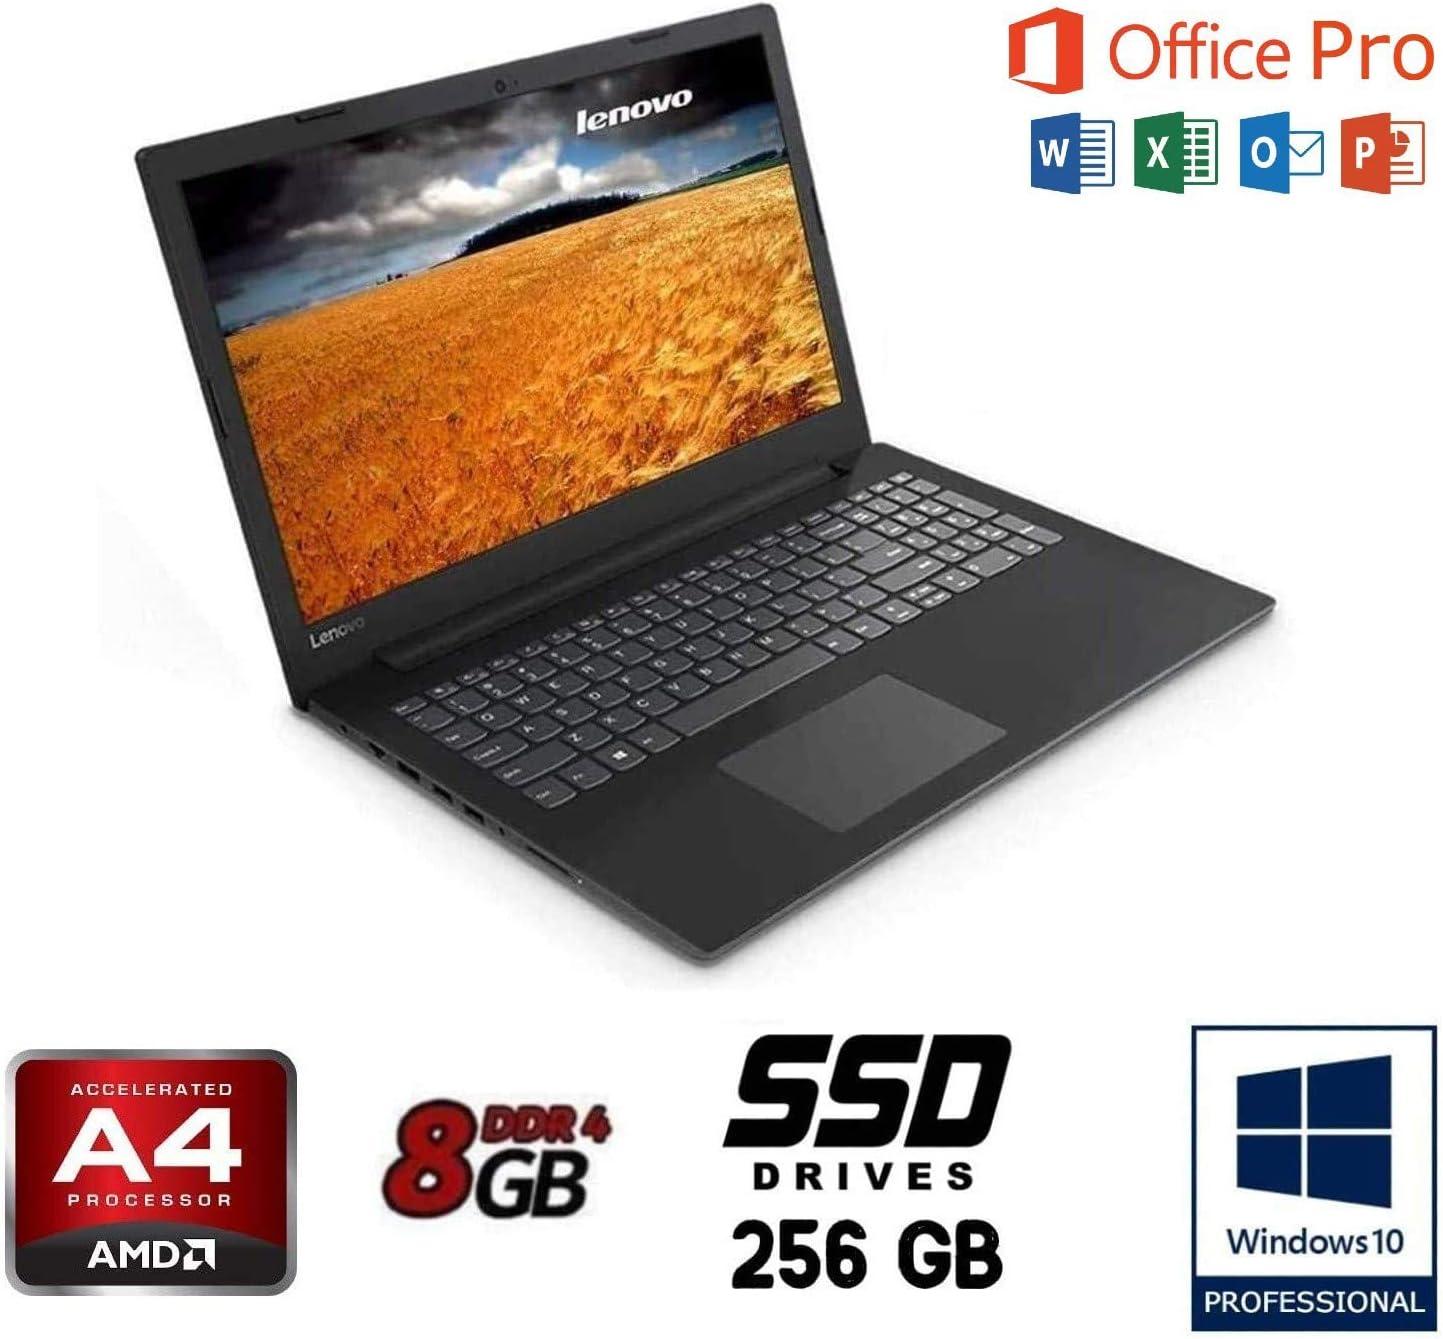 Notebook Lenovo Essential, AMD A4 2.6GHz Burst Mode, Pantalla de 15.6